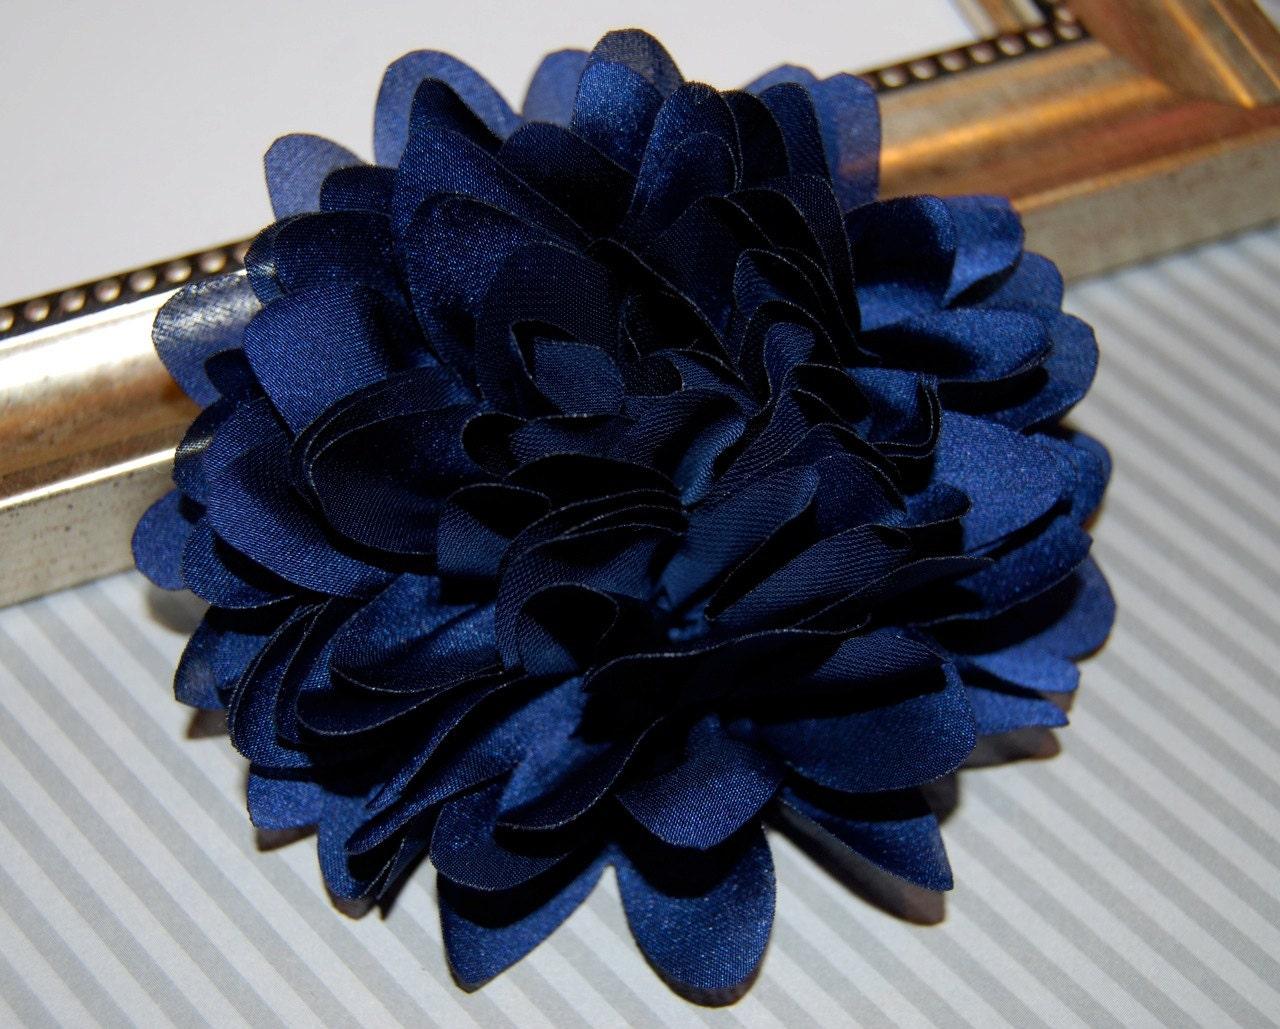 navy blue fabric flower 4u0027u0027 large silk navy blue fabric flower flat back dahlia silk flower